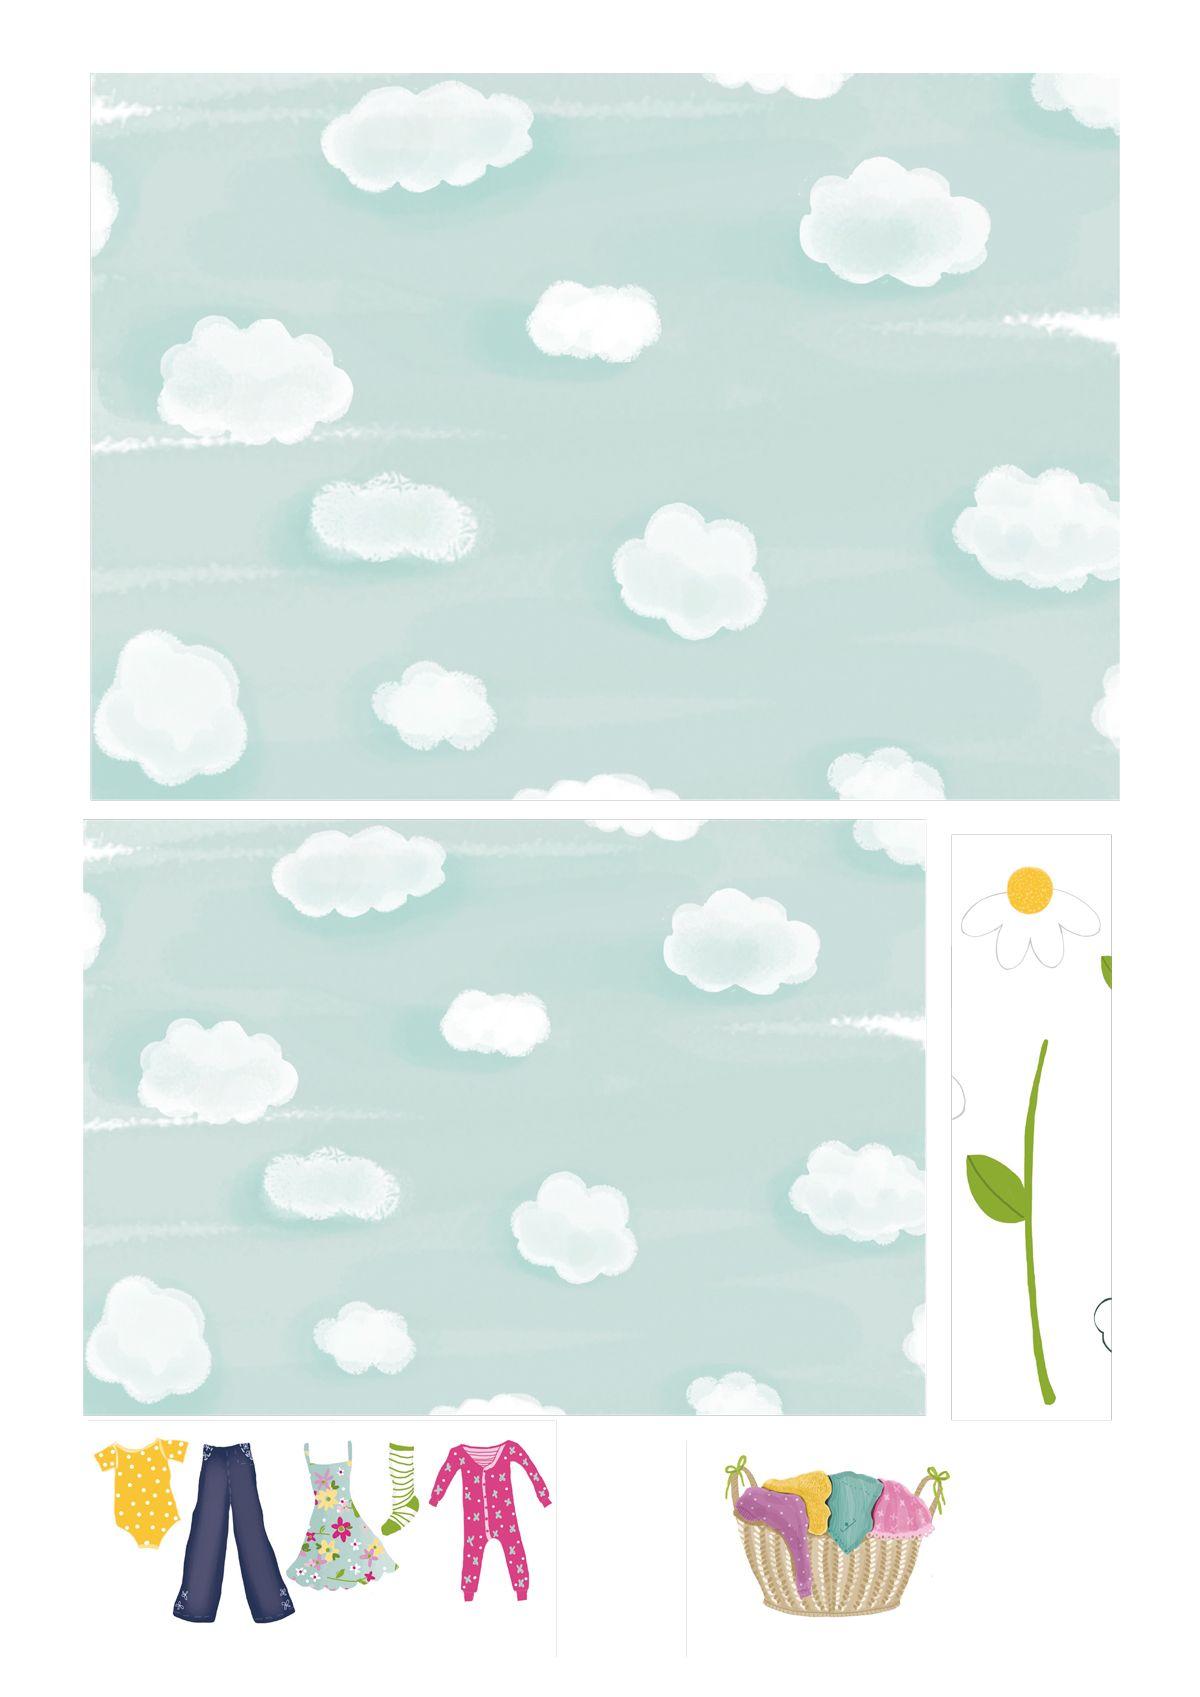 Free printable cloud patterned paper | Иллюстрации | Pinterest ...